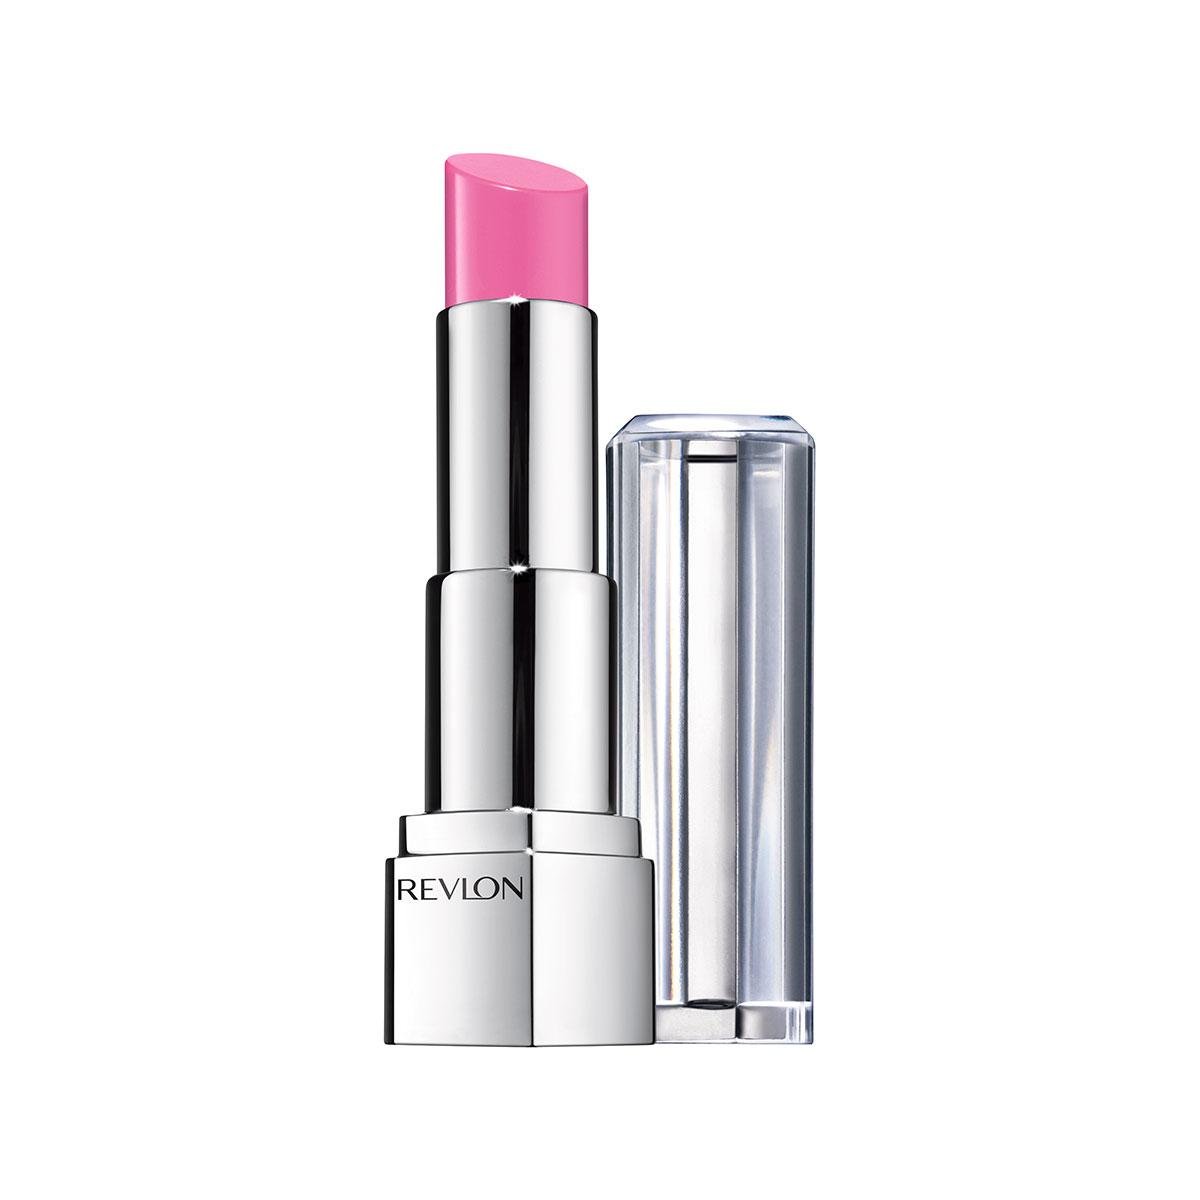 Revlon Помада для Губ Ultra Hd Lipstick Sweet pea 815 25 г 7210493075